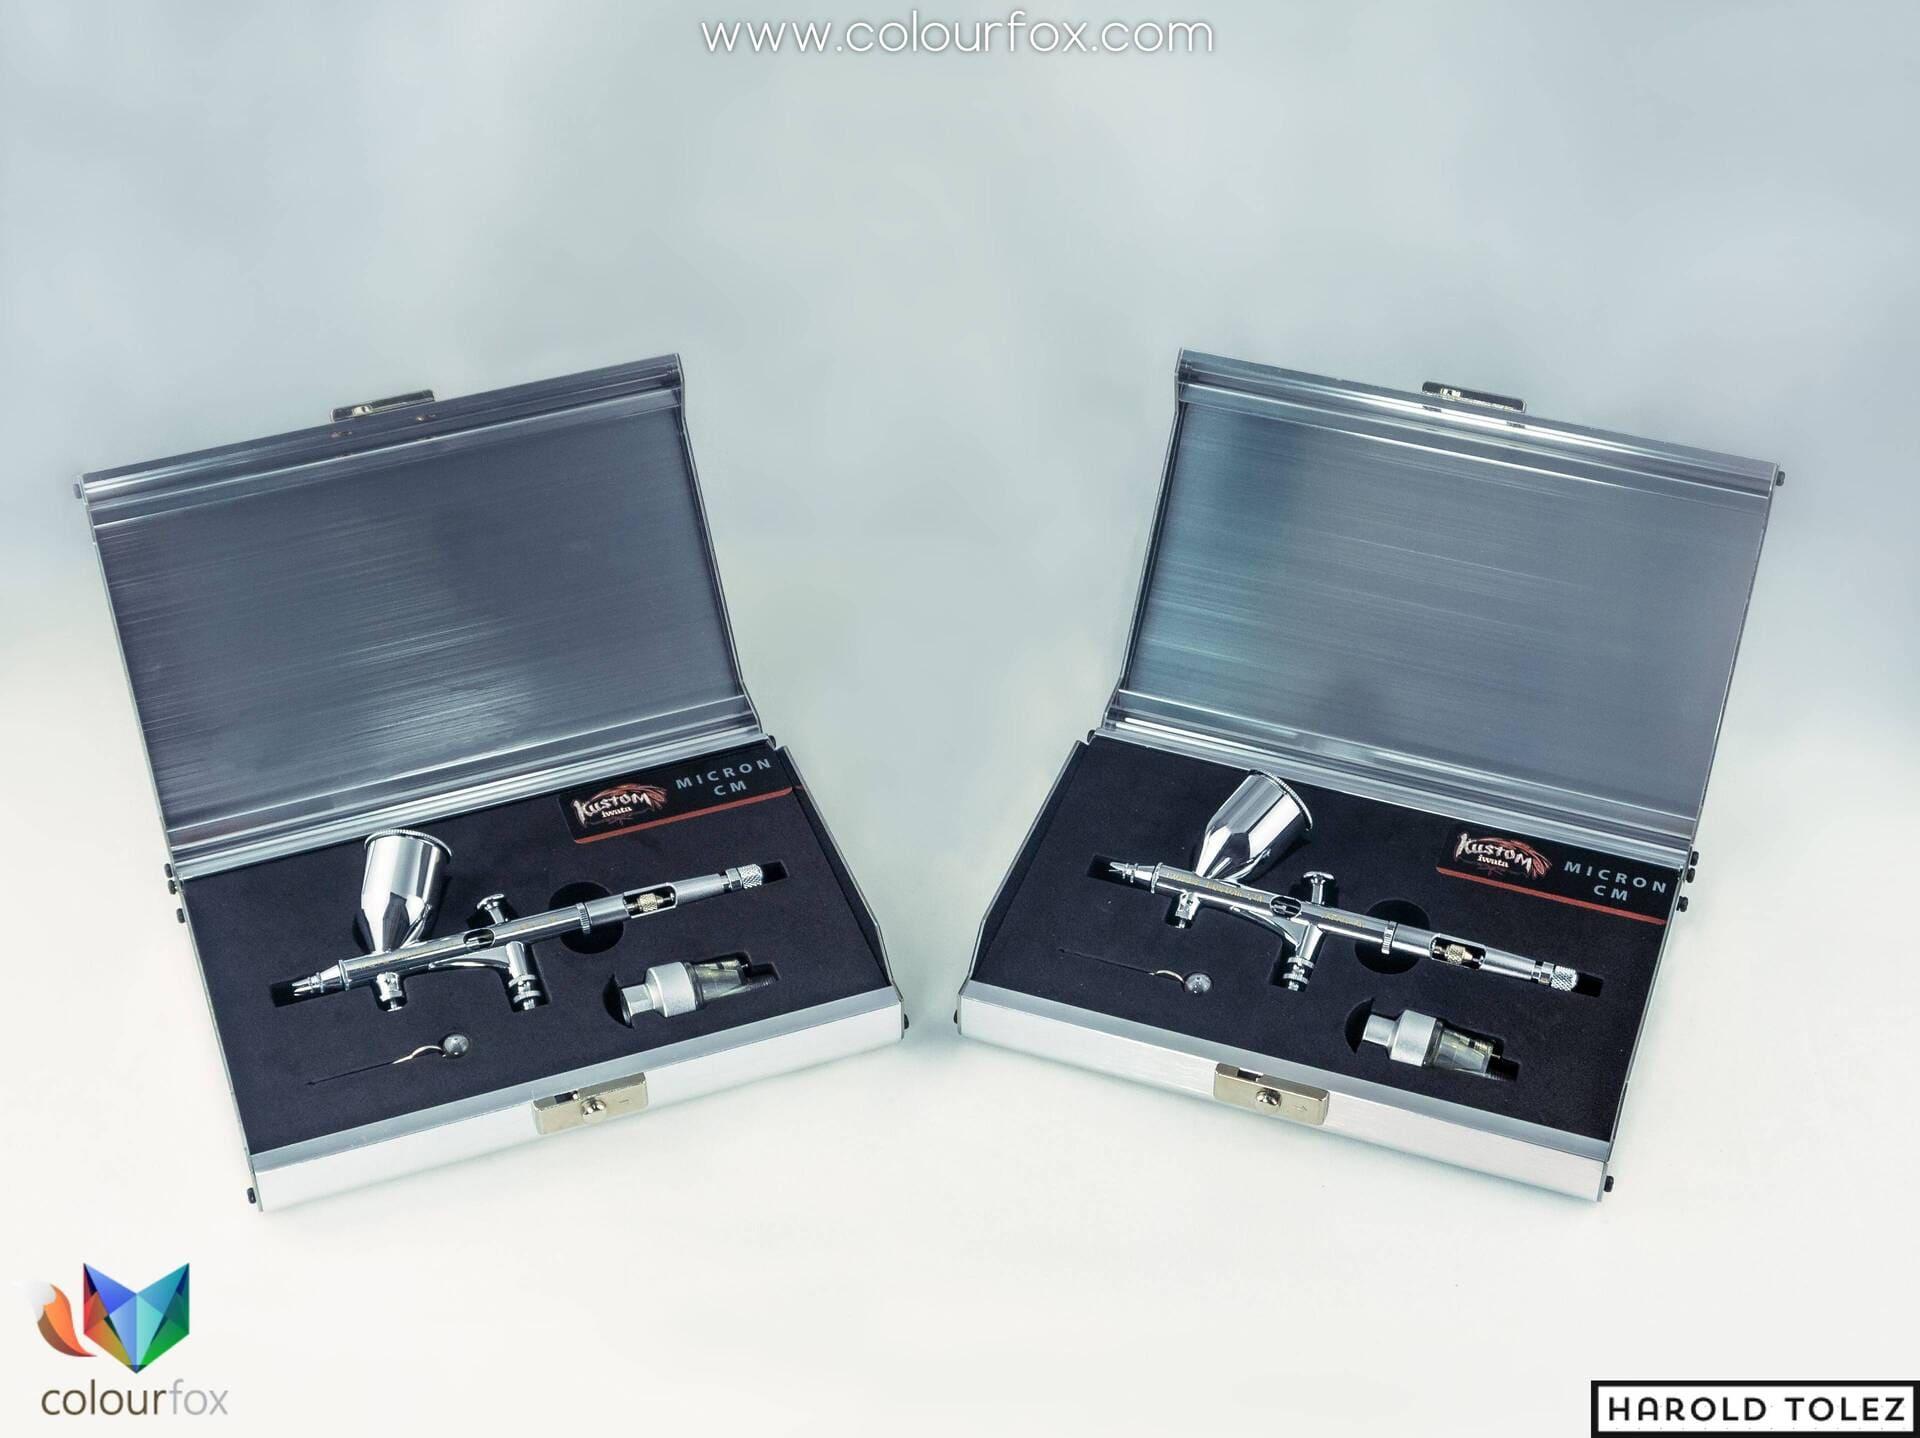 aerografo-anest-Iwata-kustom-micron-cm-paquete-case